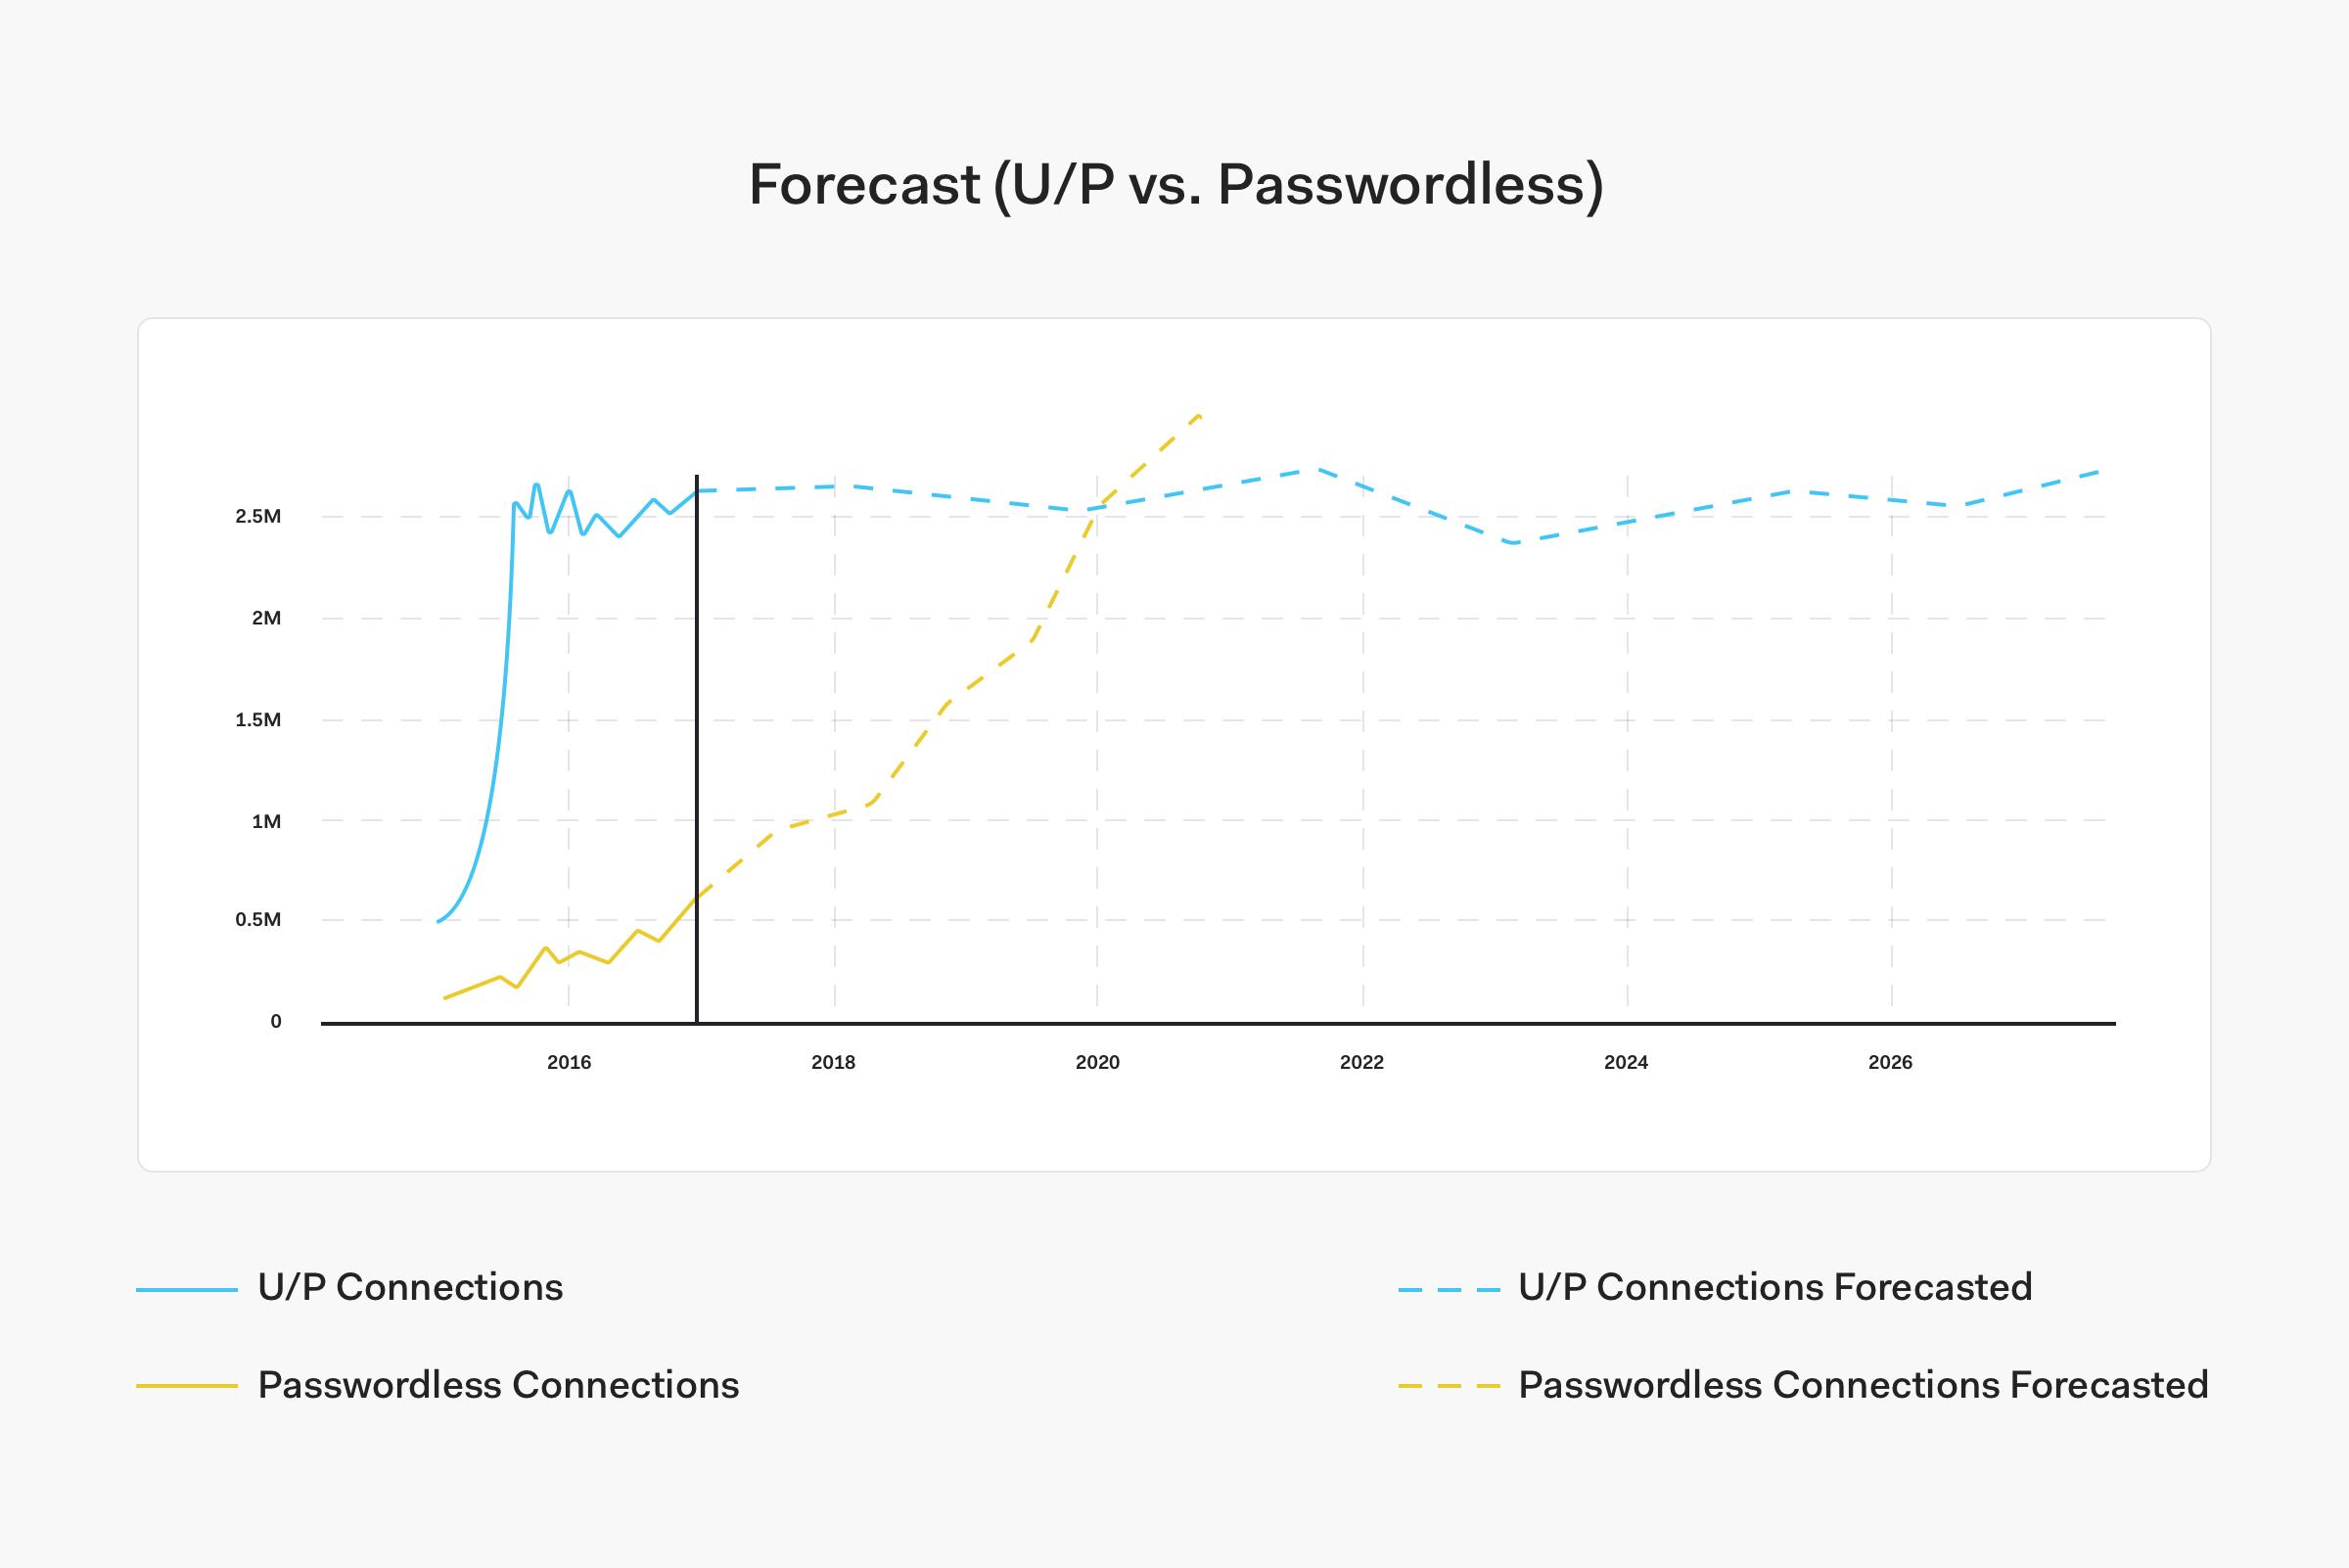 Forecast (U/P vs Passwordless